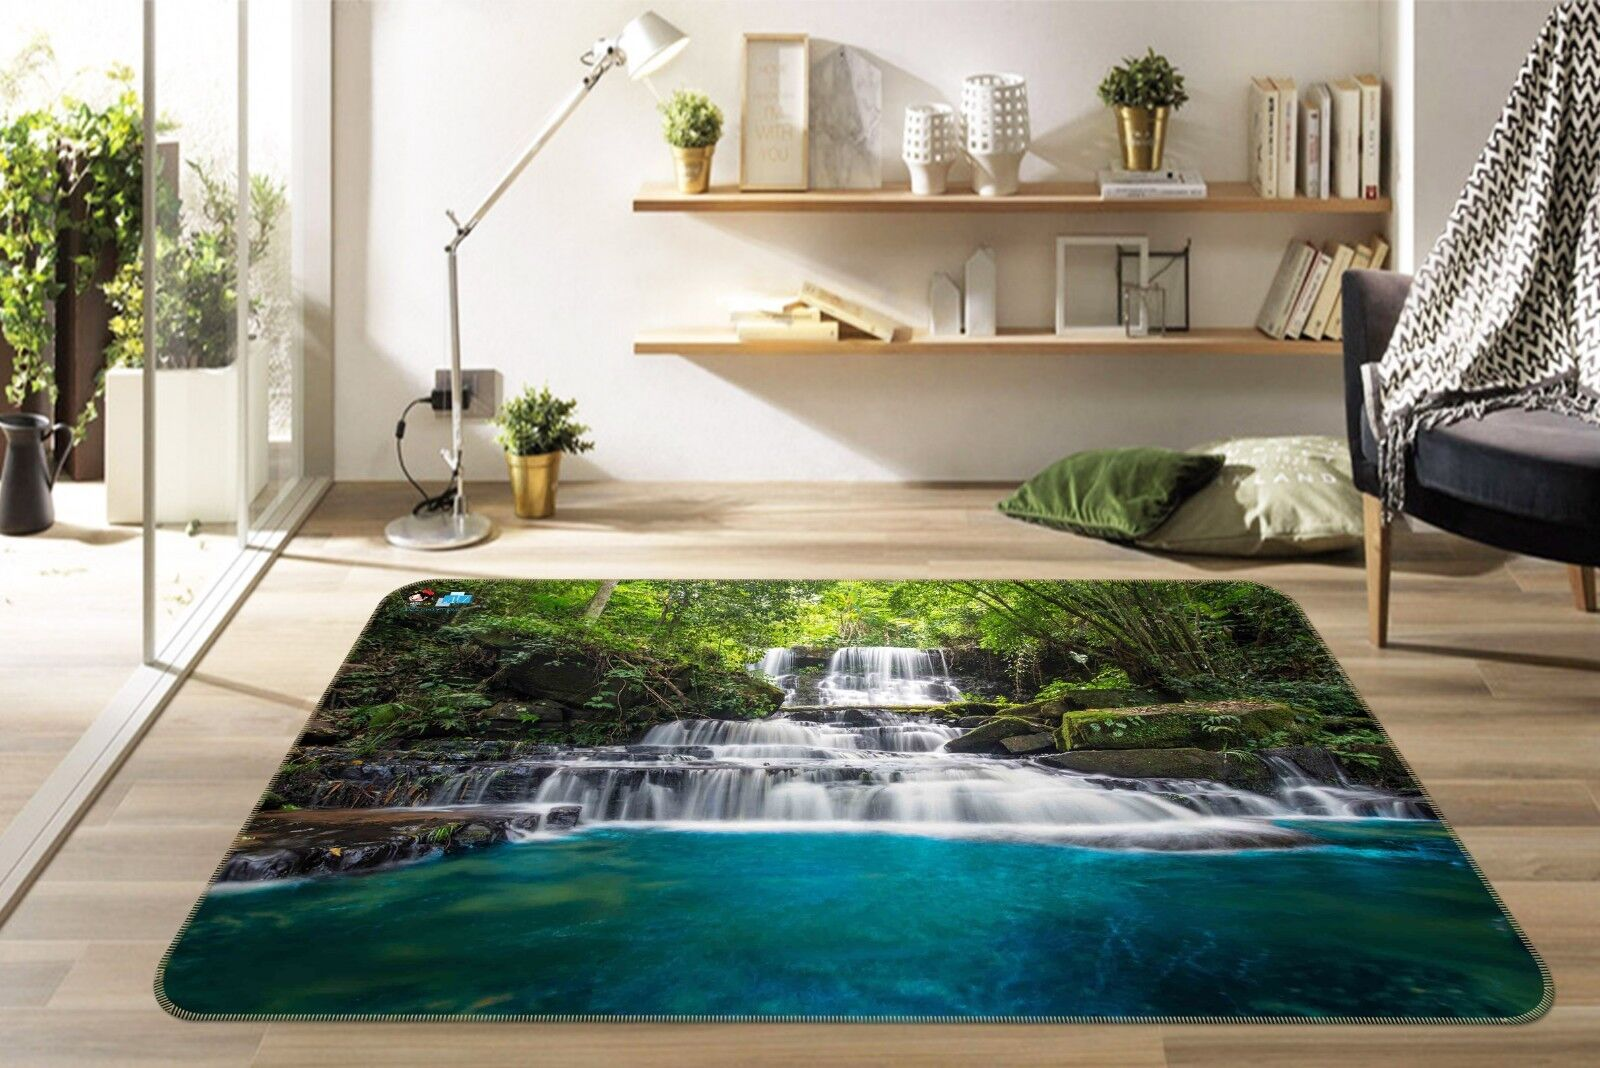 3d 022 espino albar non-slip Carpet mat quality elegante Carpet de Summer